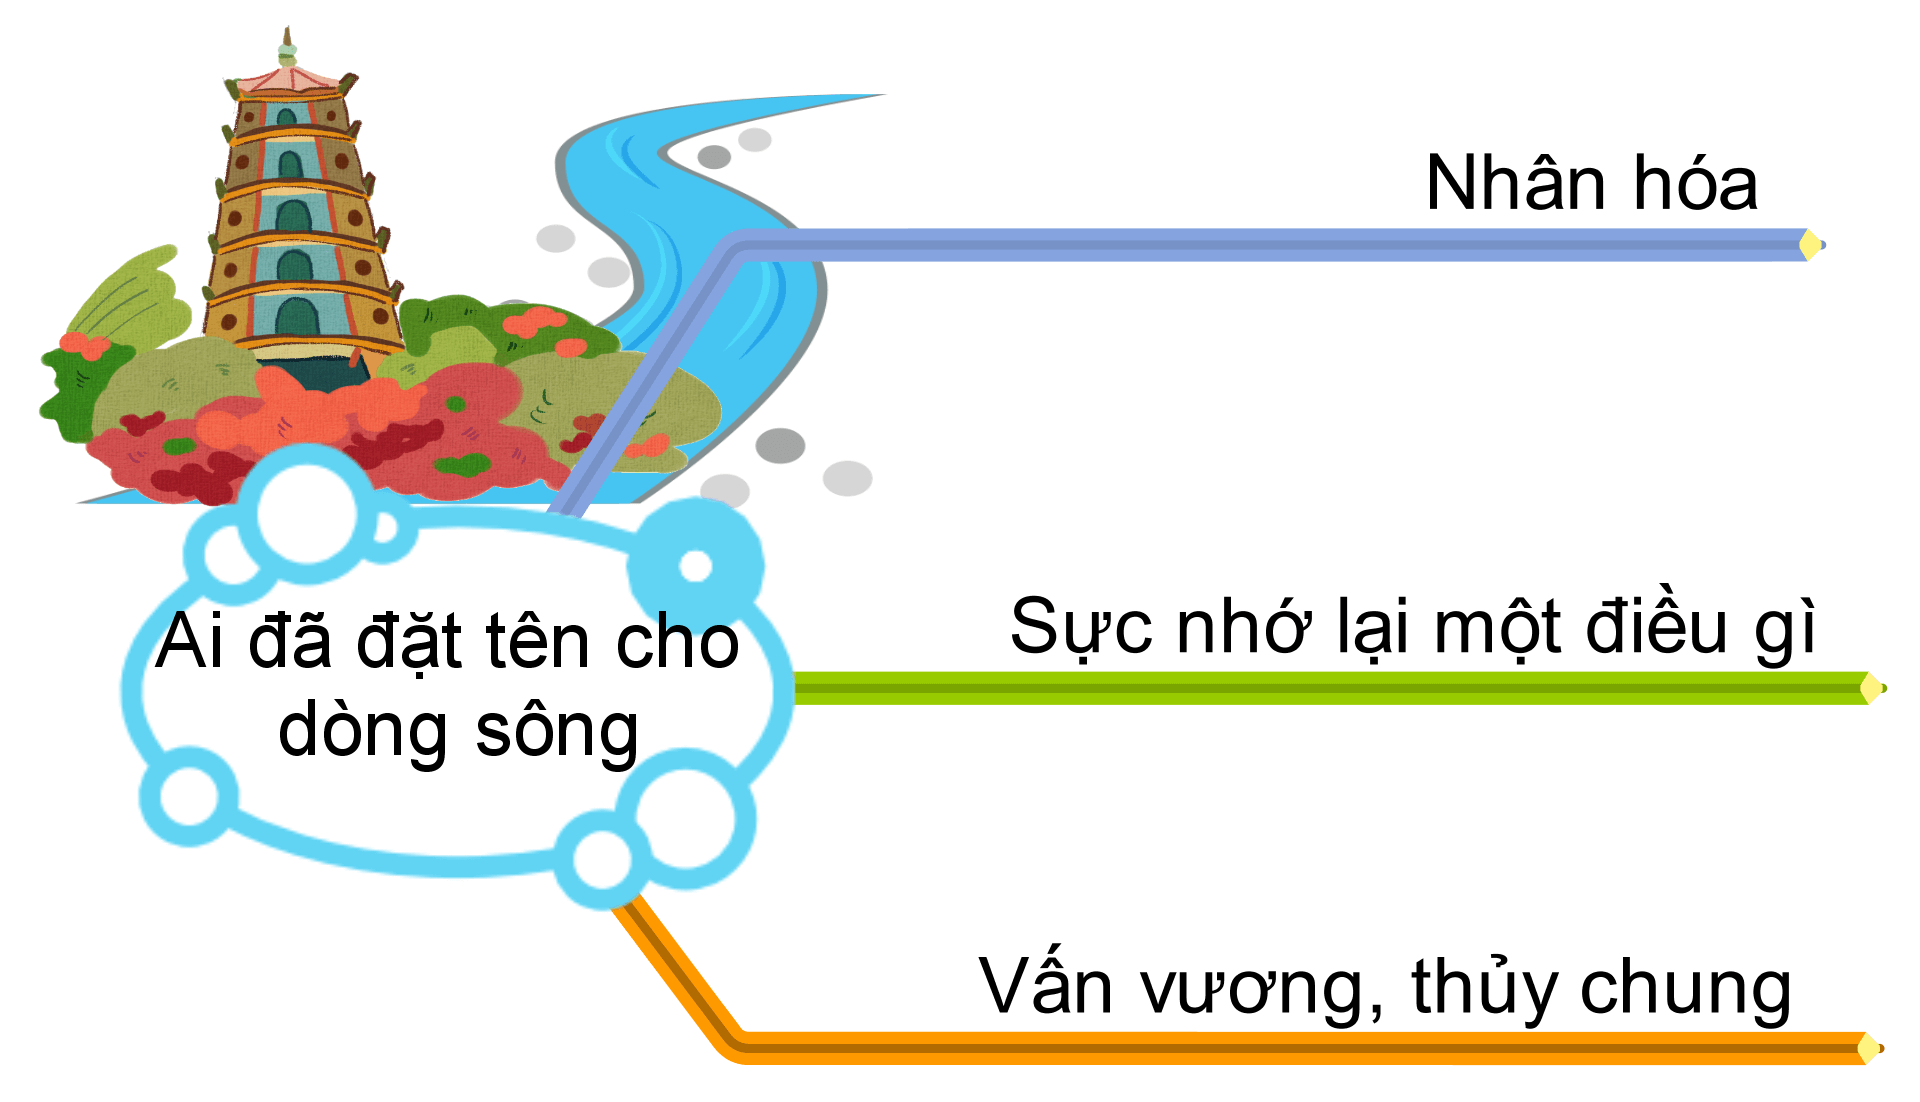 ai-da-dat-ten-cho-dong-song